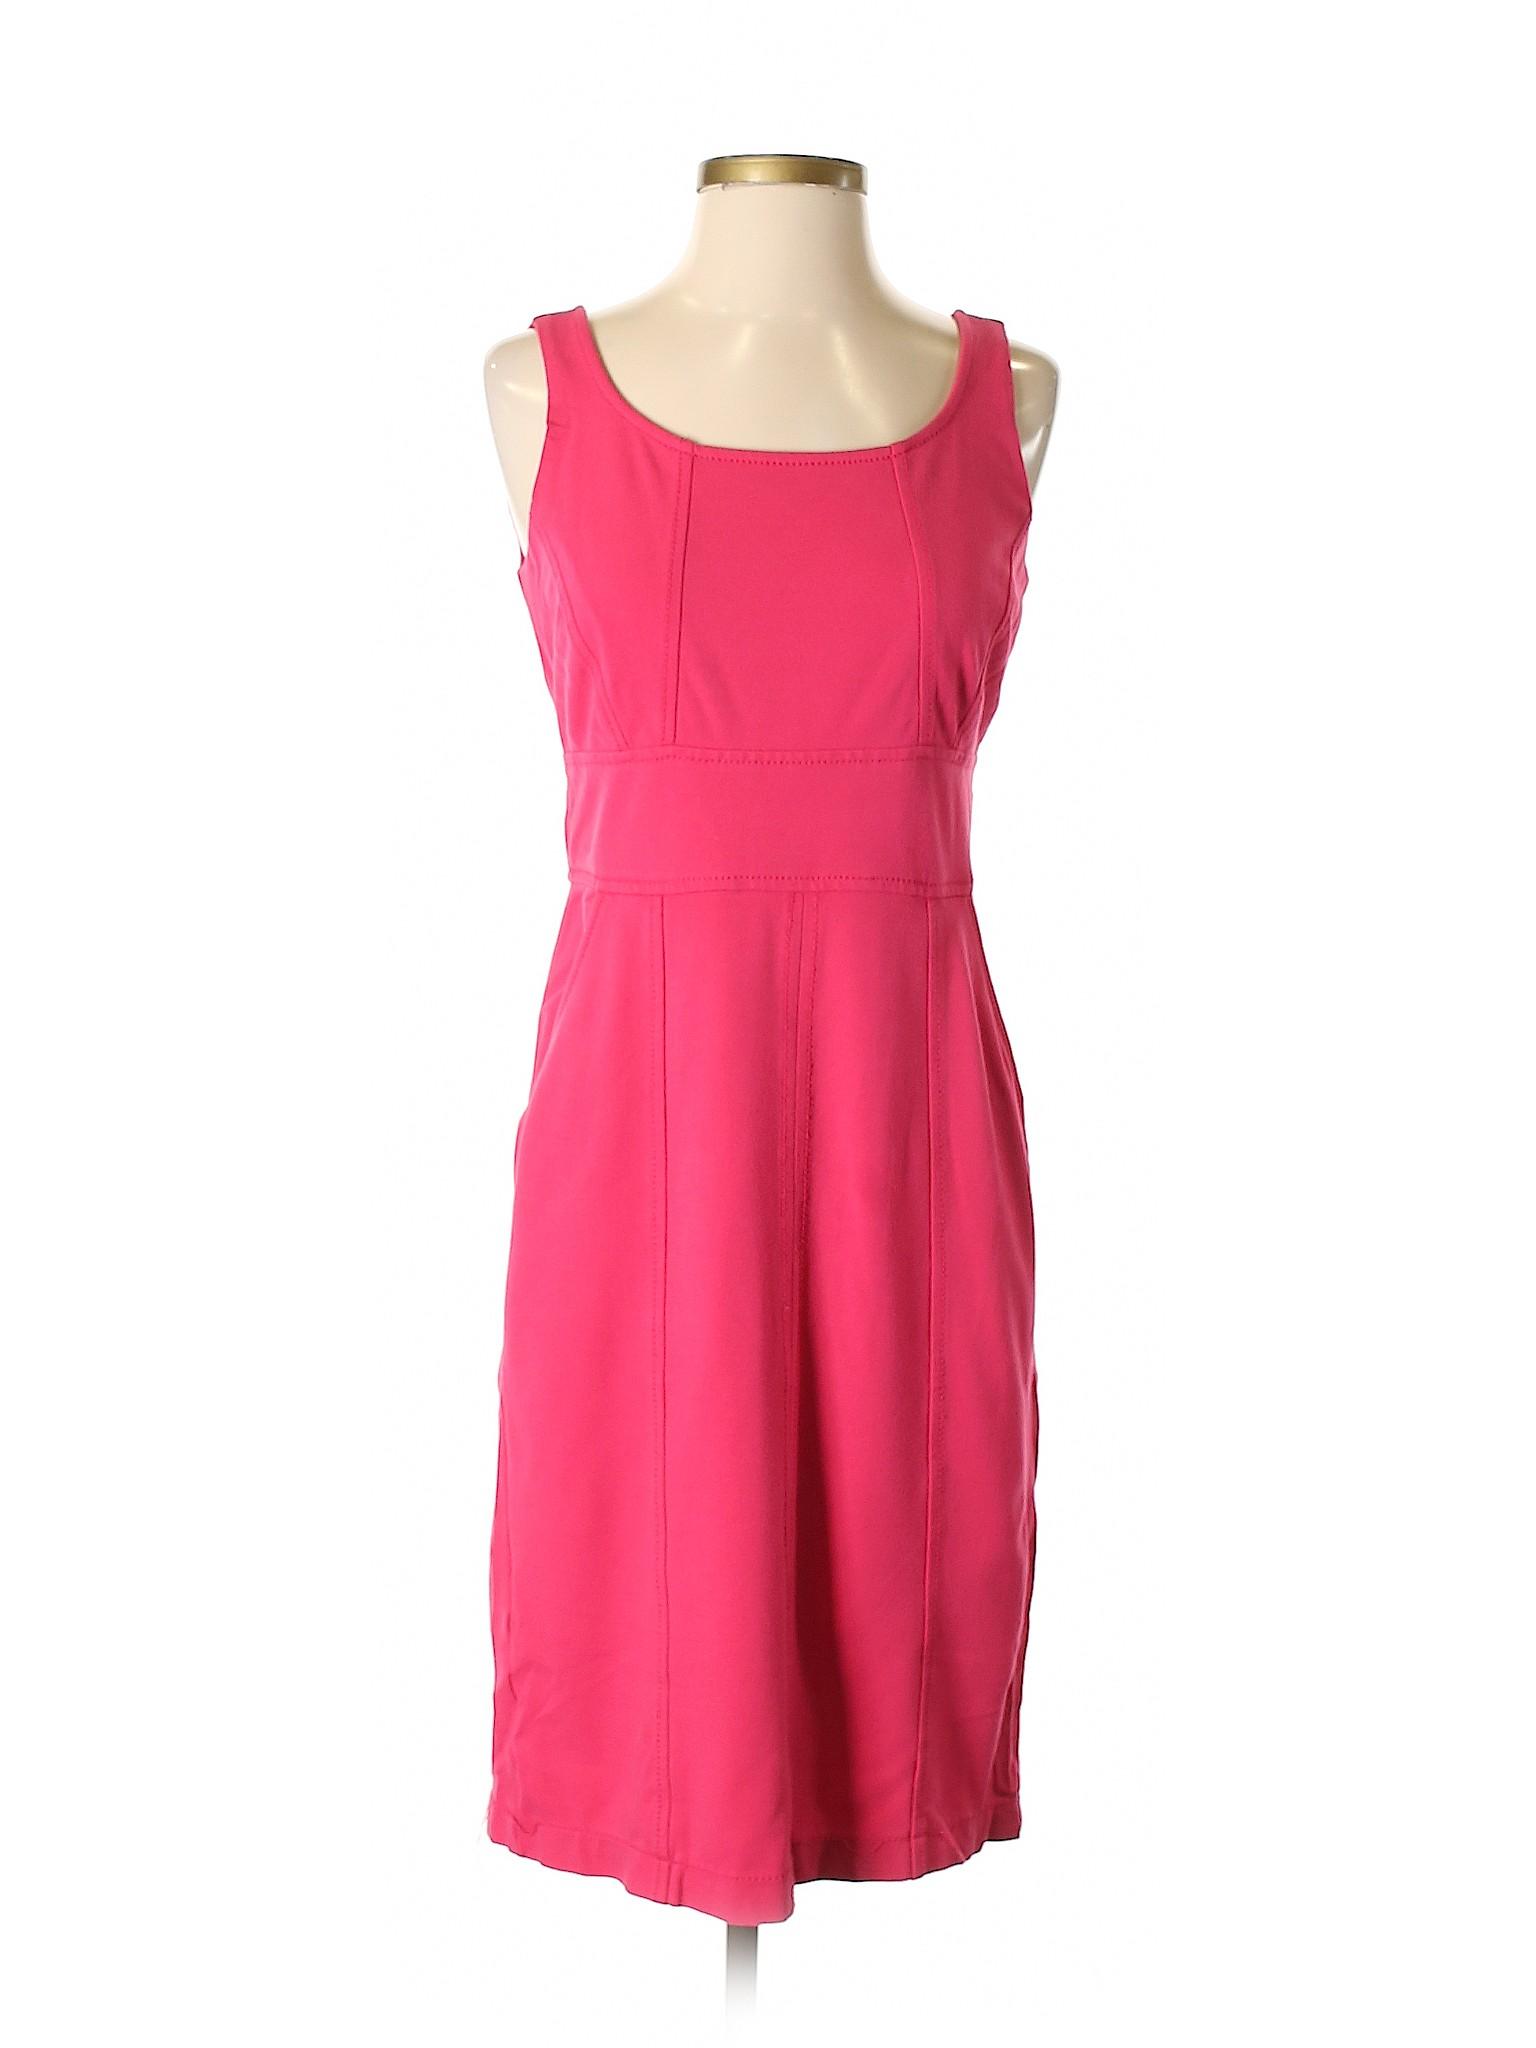 Selling Taylor Taylor Casual Ann Ann Dress Selling Dress Ann Selling Taylor Casual rwq4rfaz